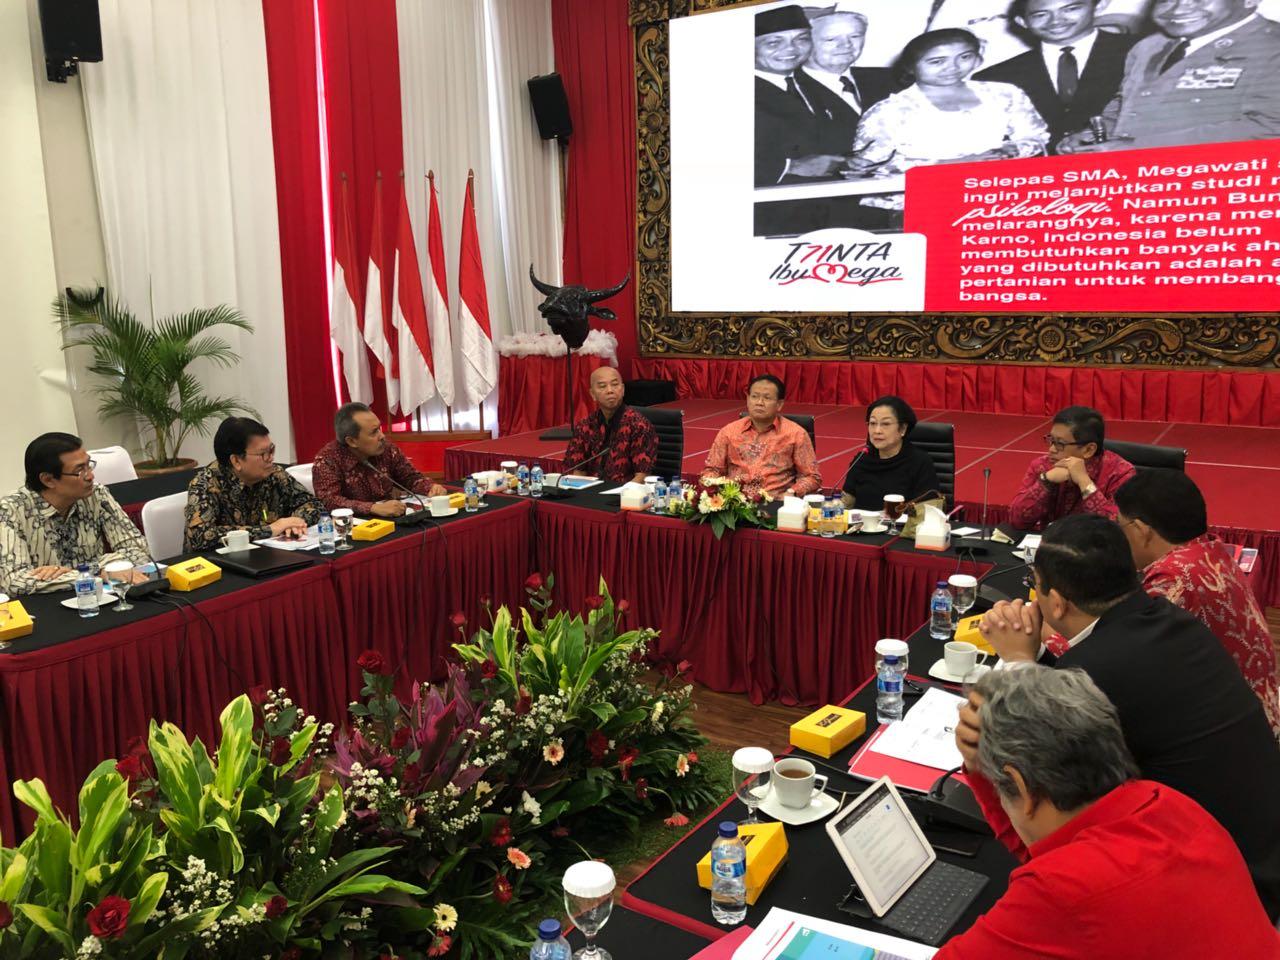 https: img-k.okeinfo.net content 2018 03 15 337 1873325 megawati-indonesia-sudah-sepantasnya-miliki-badan-riset-nasional-wgApCsIskk.jpeg